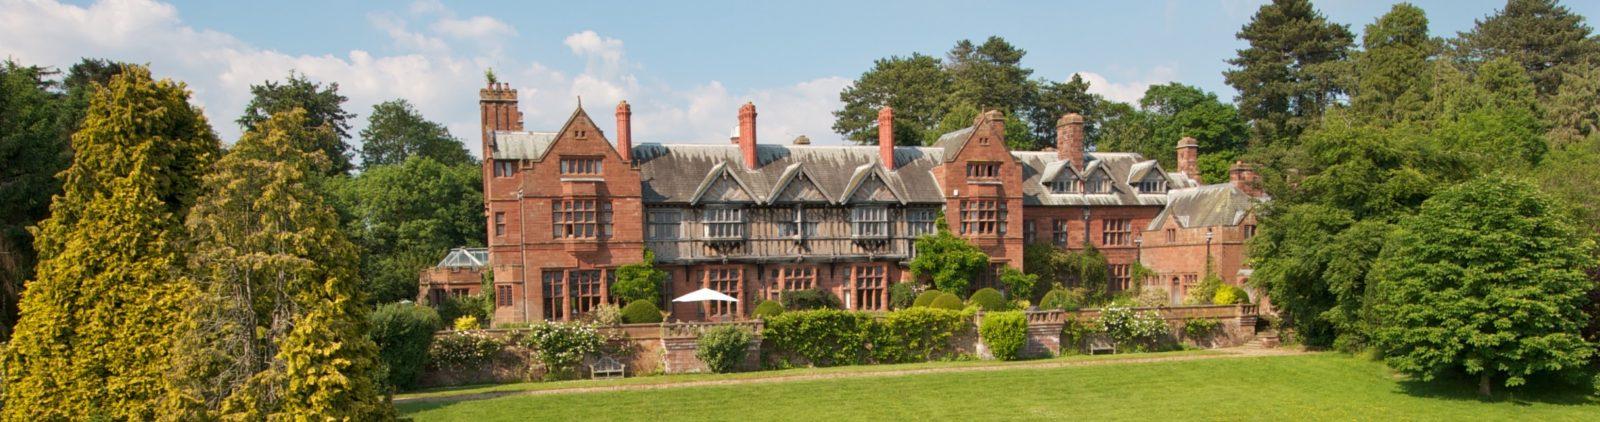 Selected contents of Yeaton Peverey Hall, Shrewsbury, Shropshire.